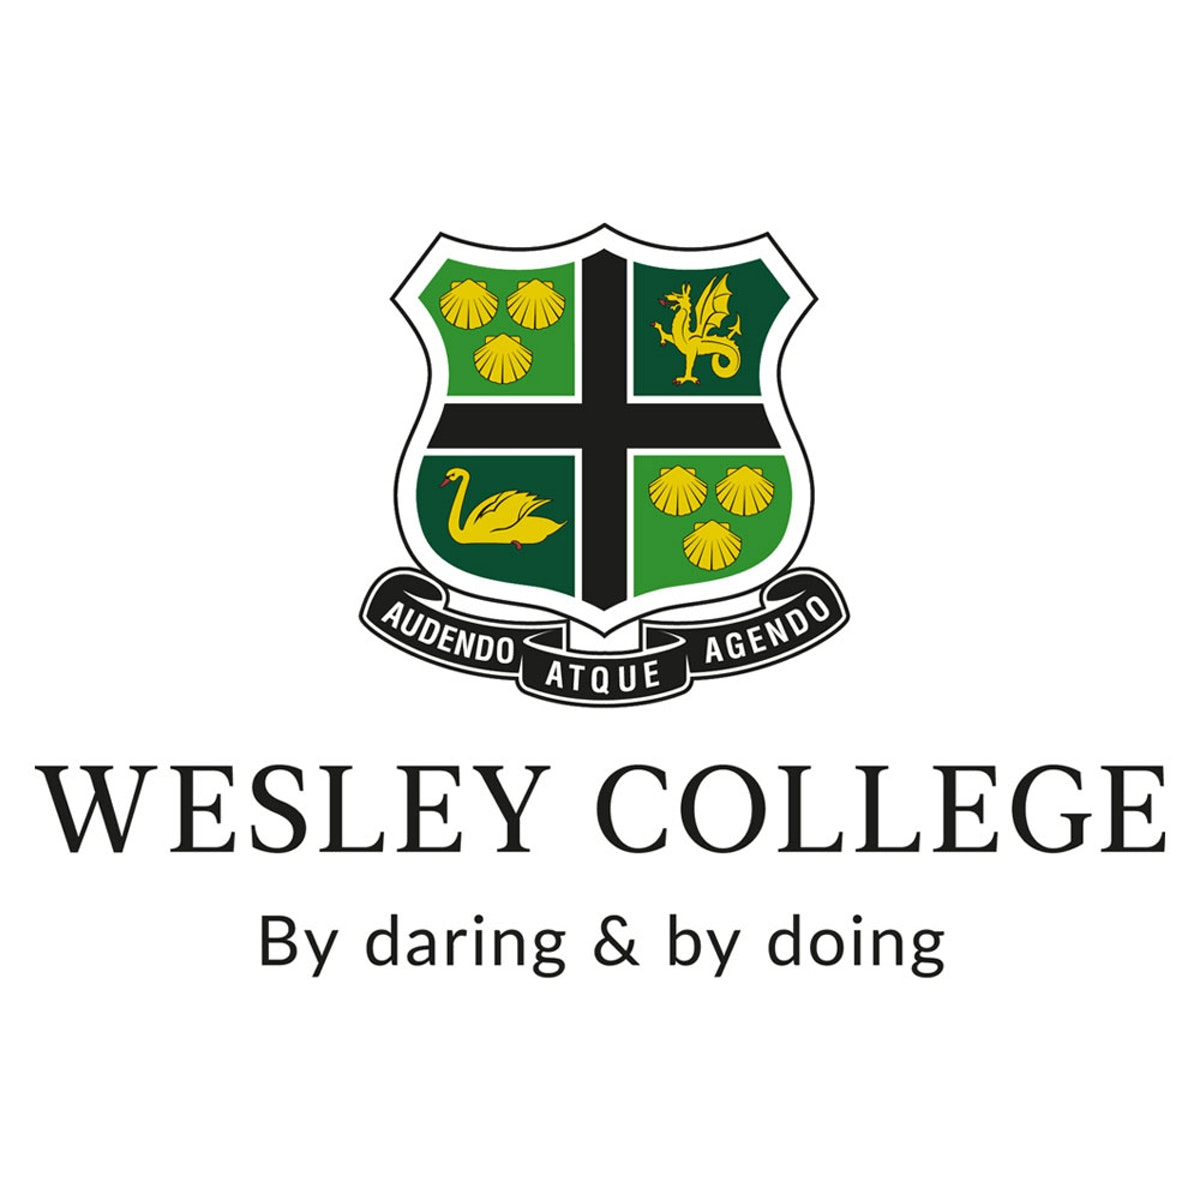 wesleycollege.jpg